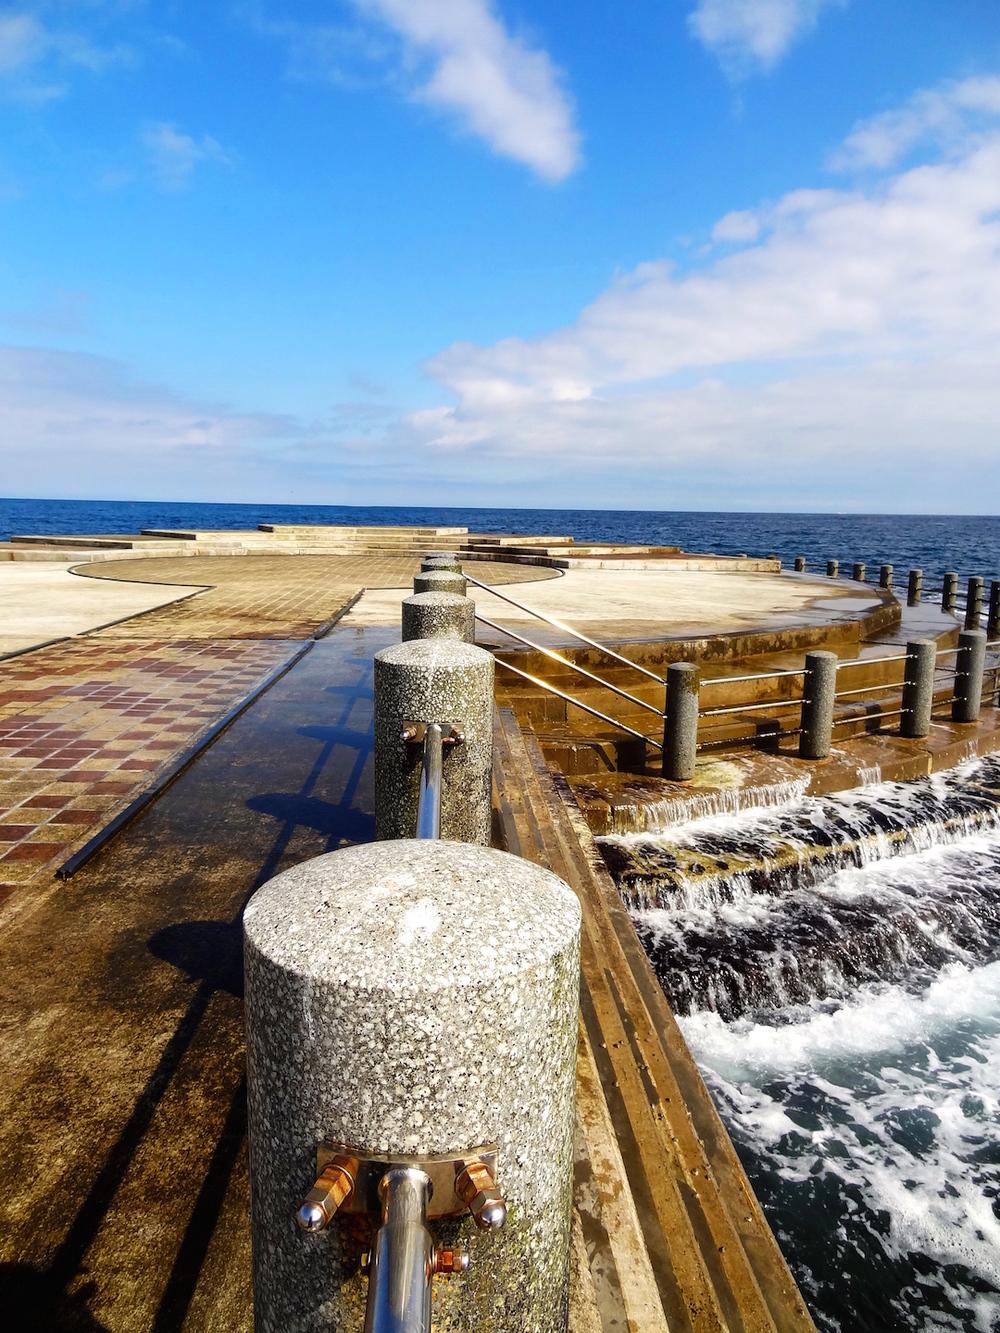 Niigata and the Sea of Japan